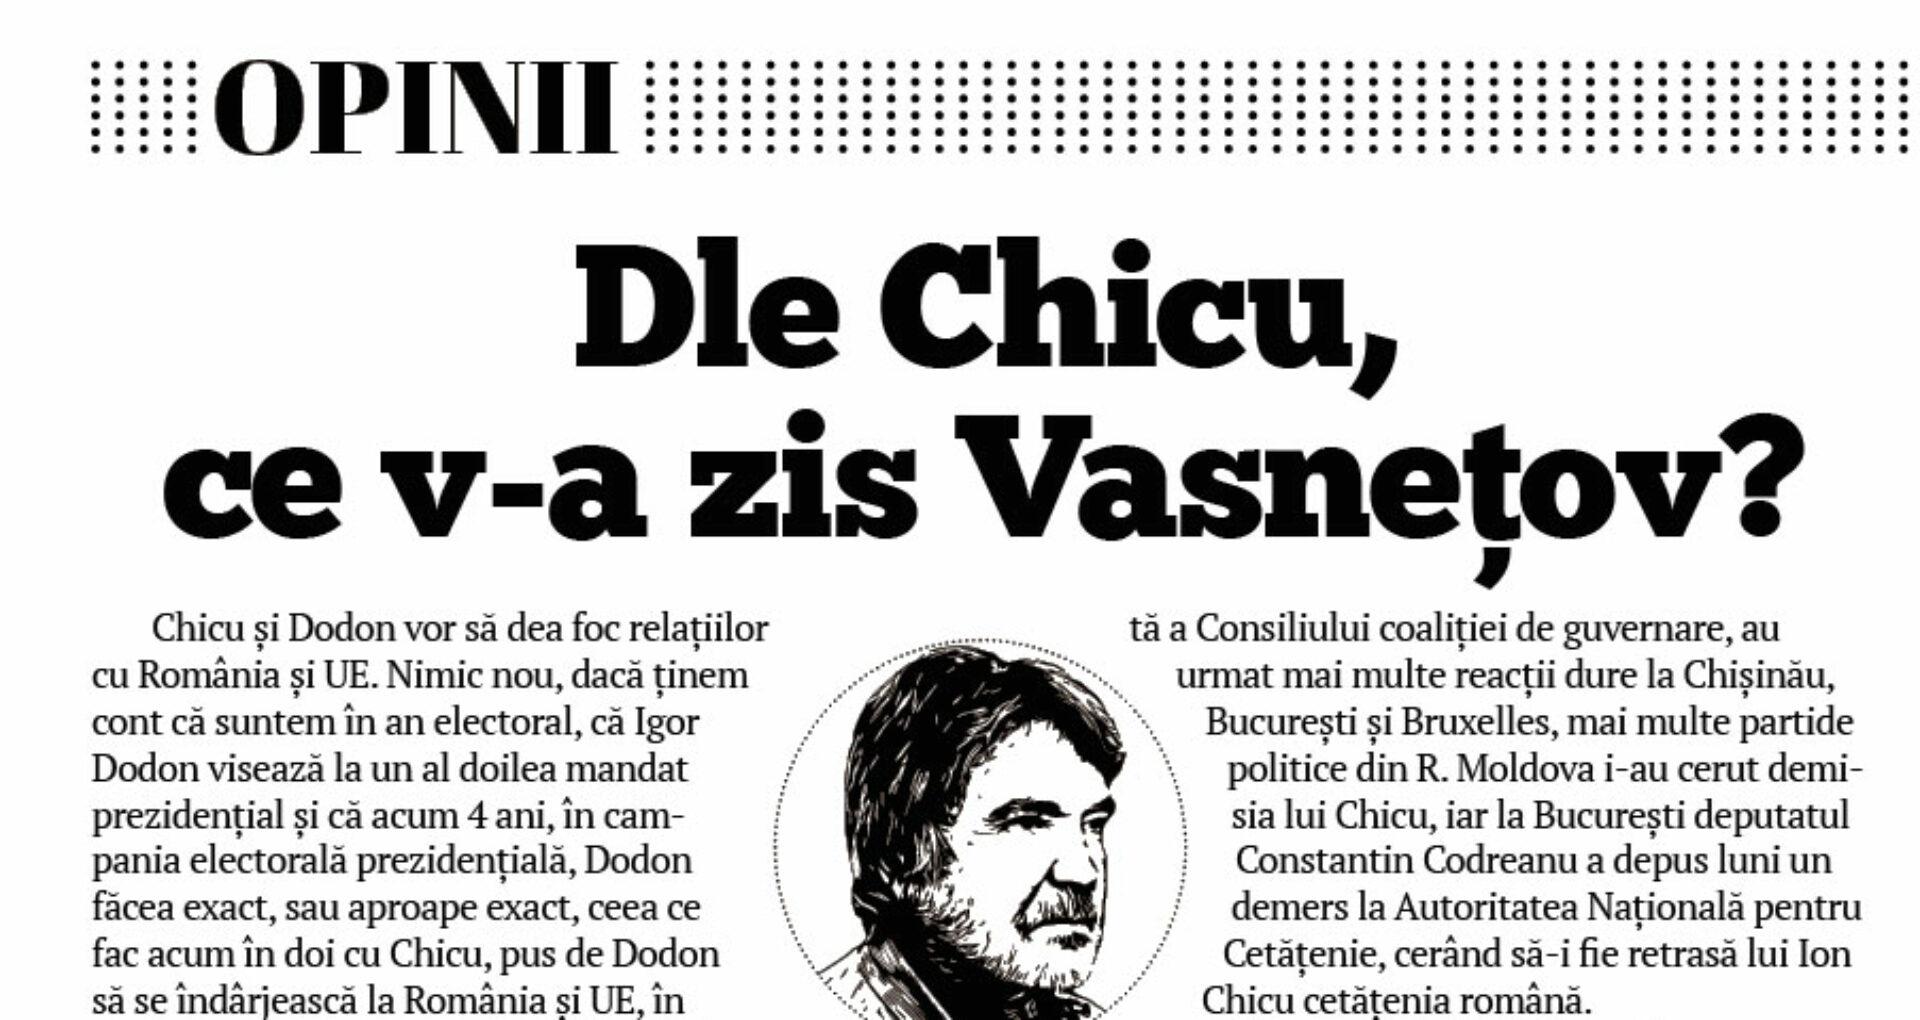 Dle Chicu, ce v-a zis Vasnețov?